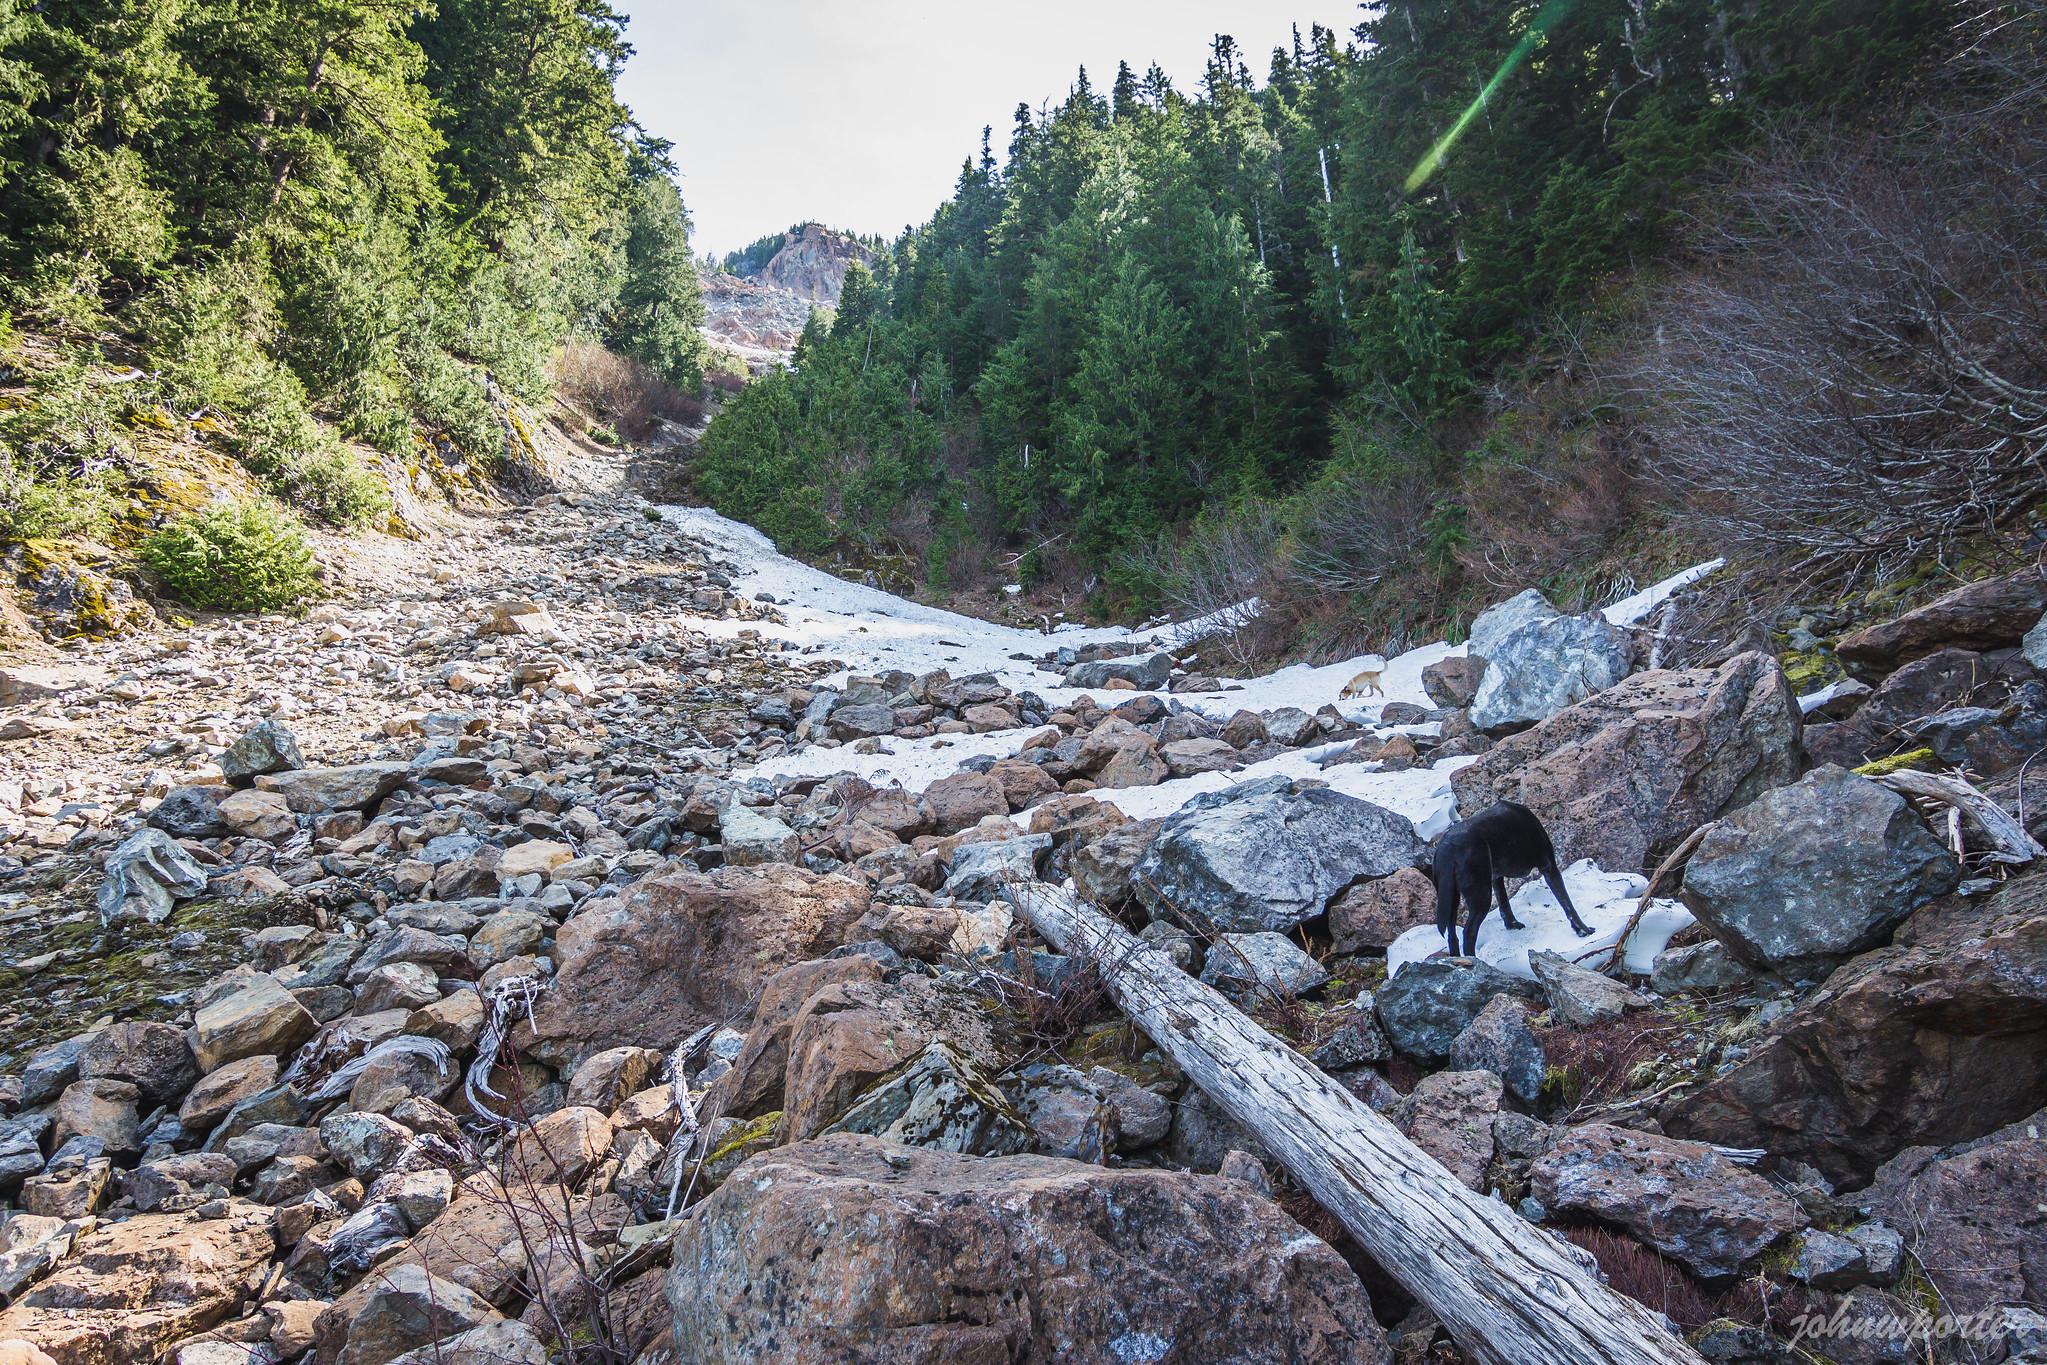 The main gully